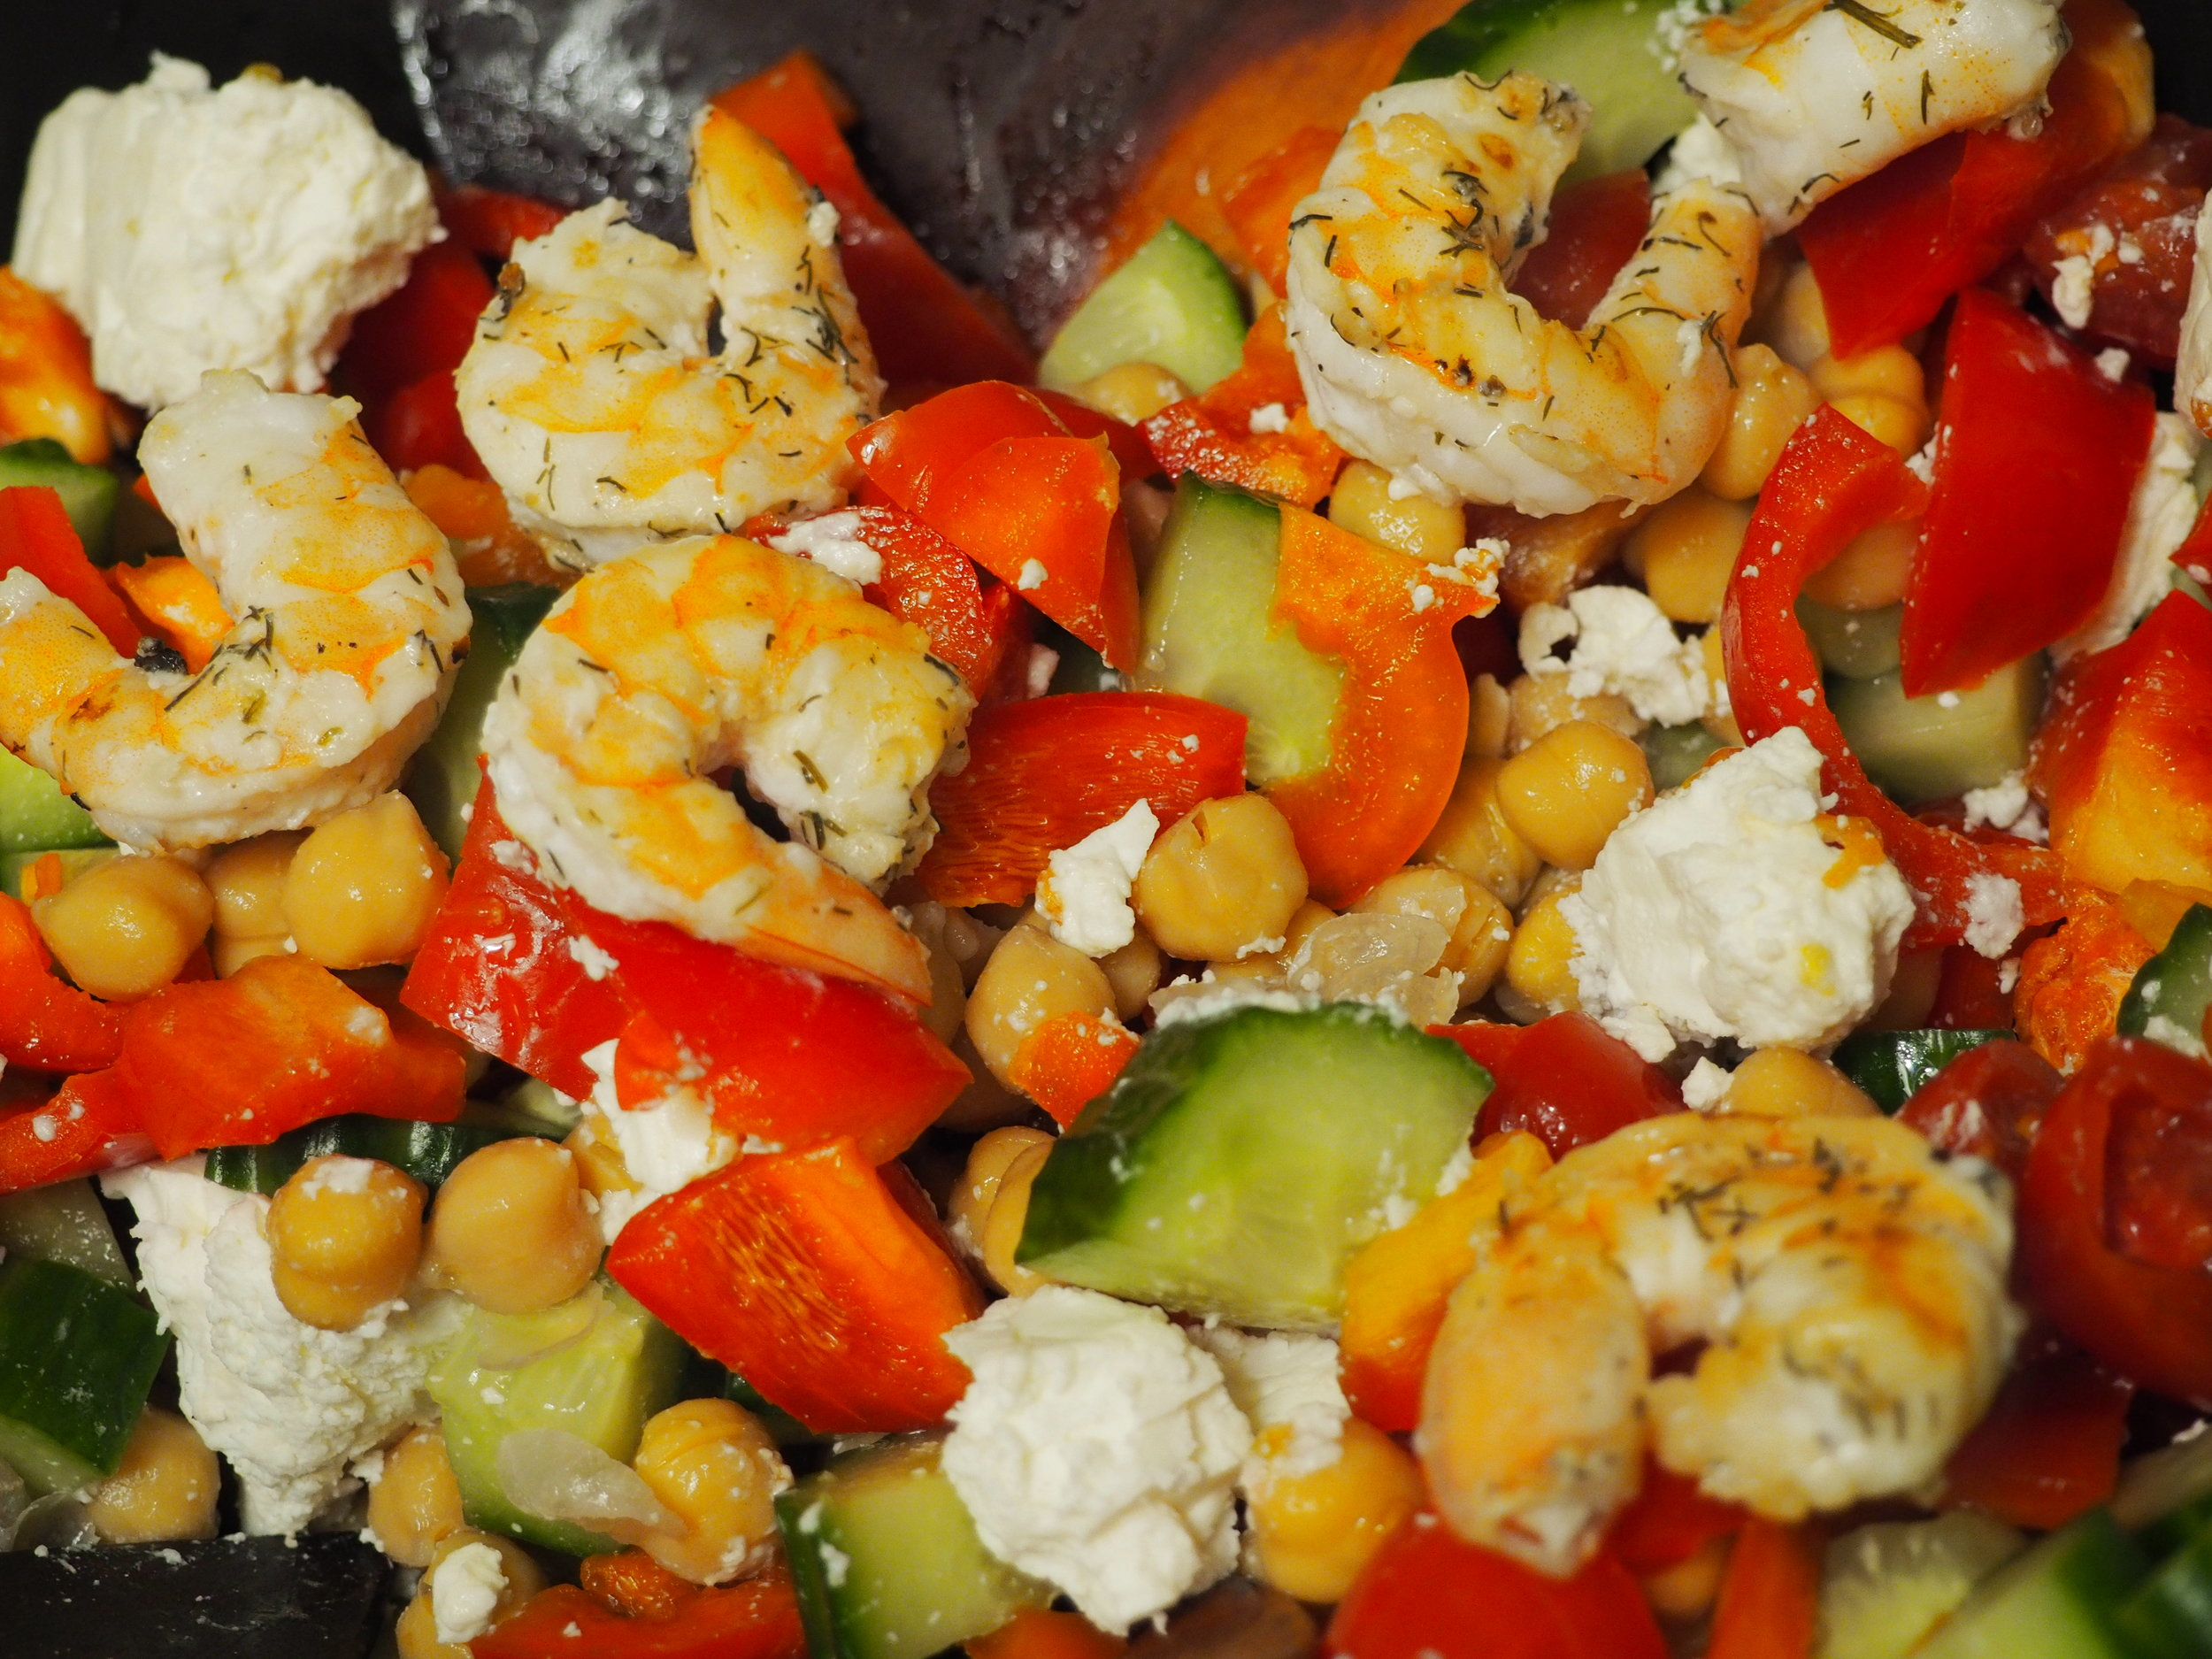 Mediterranean Shrimp Salad with Grilled Bread -